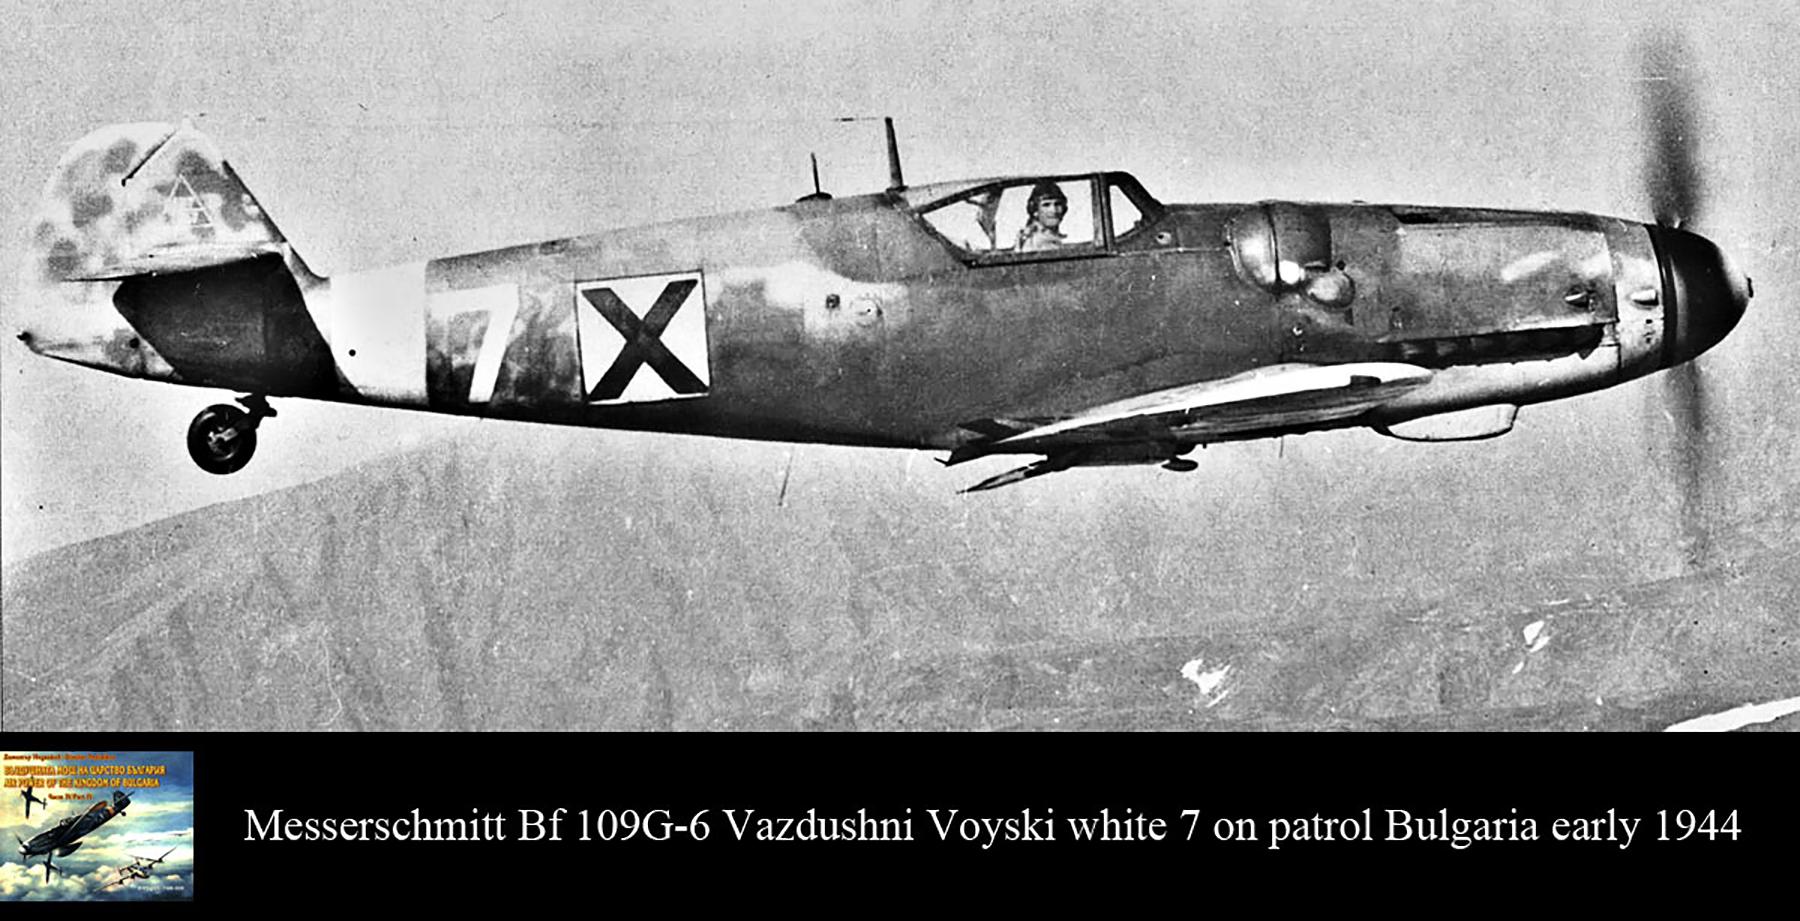 Messerschmitt Bf 109G6 Erla RBuAF 3.6 Orljak White 7 Stoyan Stoyanov Kdr over Bulgaria early 1944 01